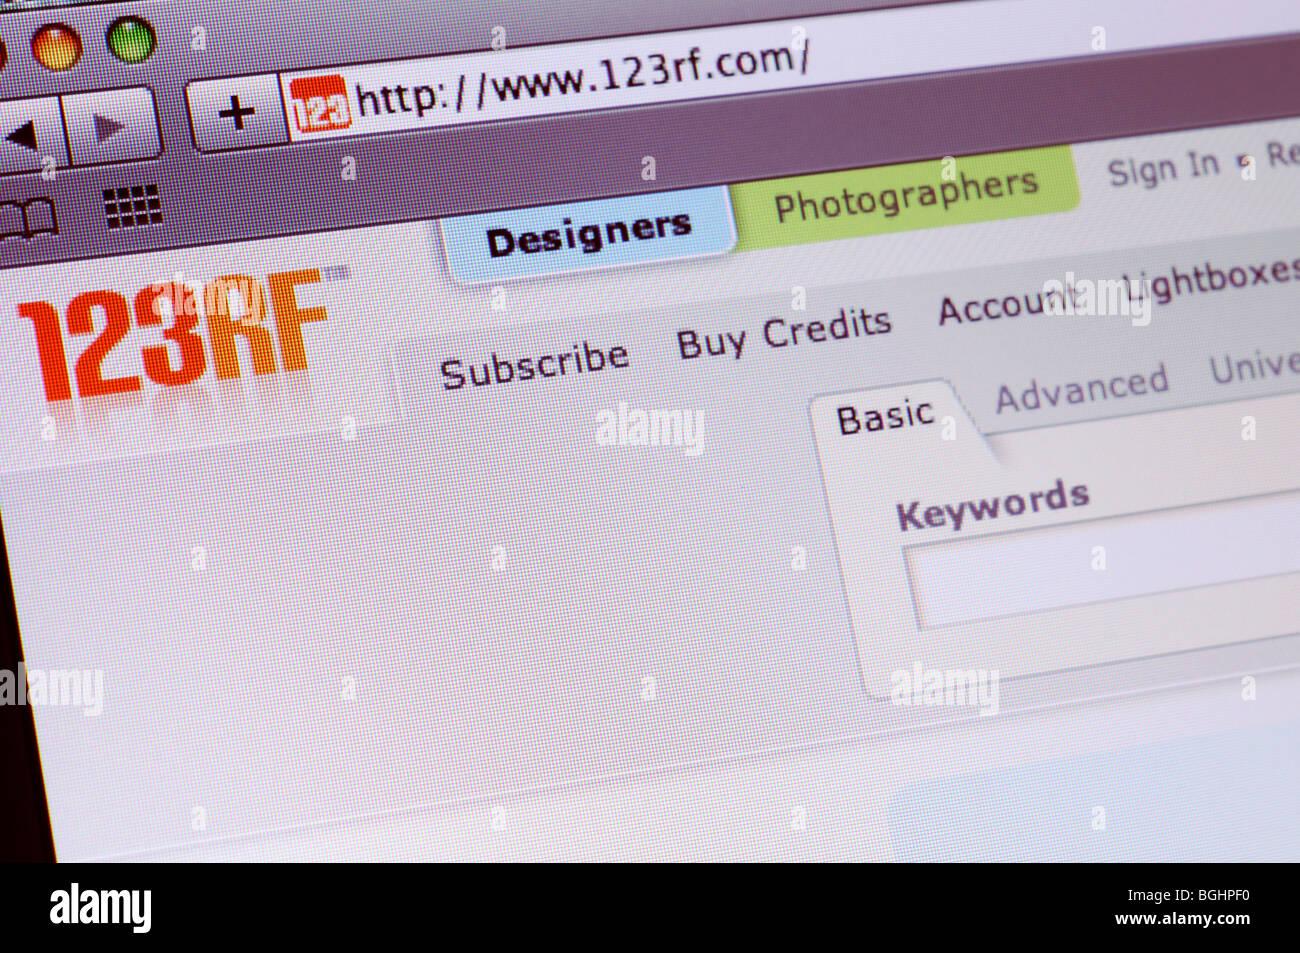 123RF photo stock agency website - Stock Image